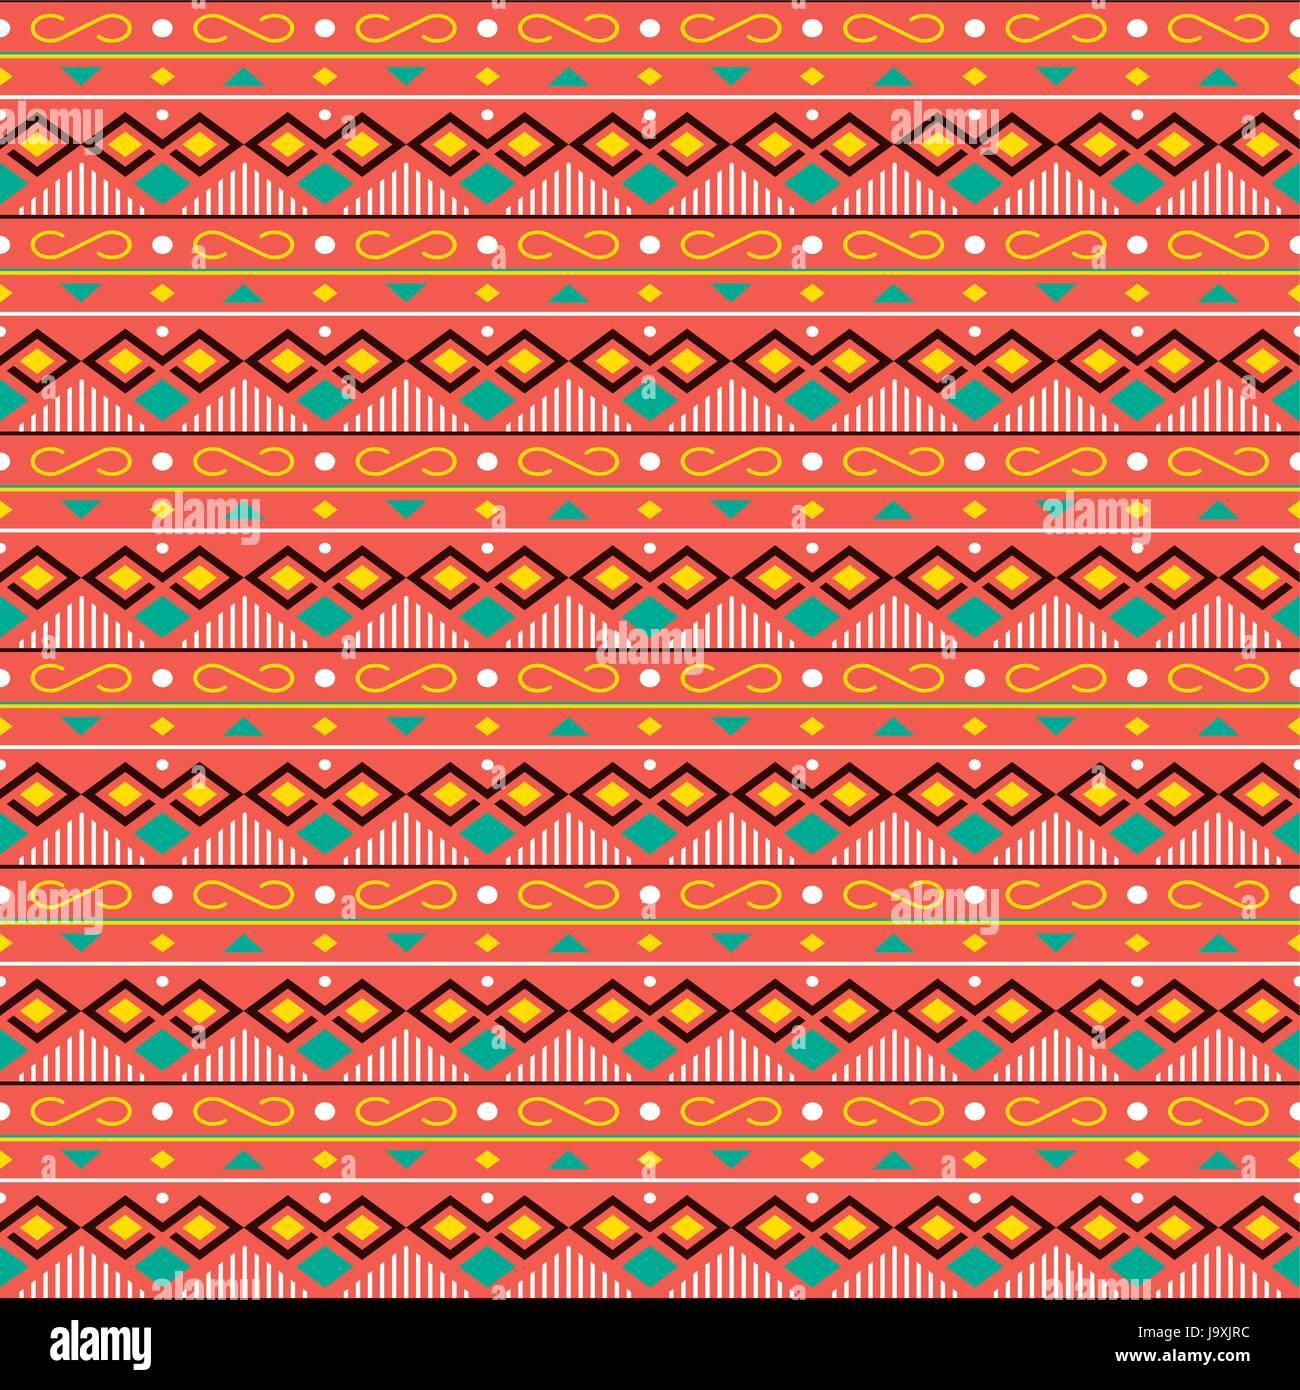 Ethnic Boho Seamless Patterns Vintage Ornament Background